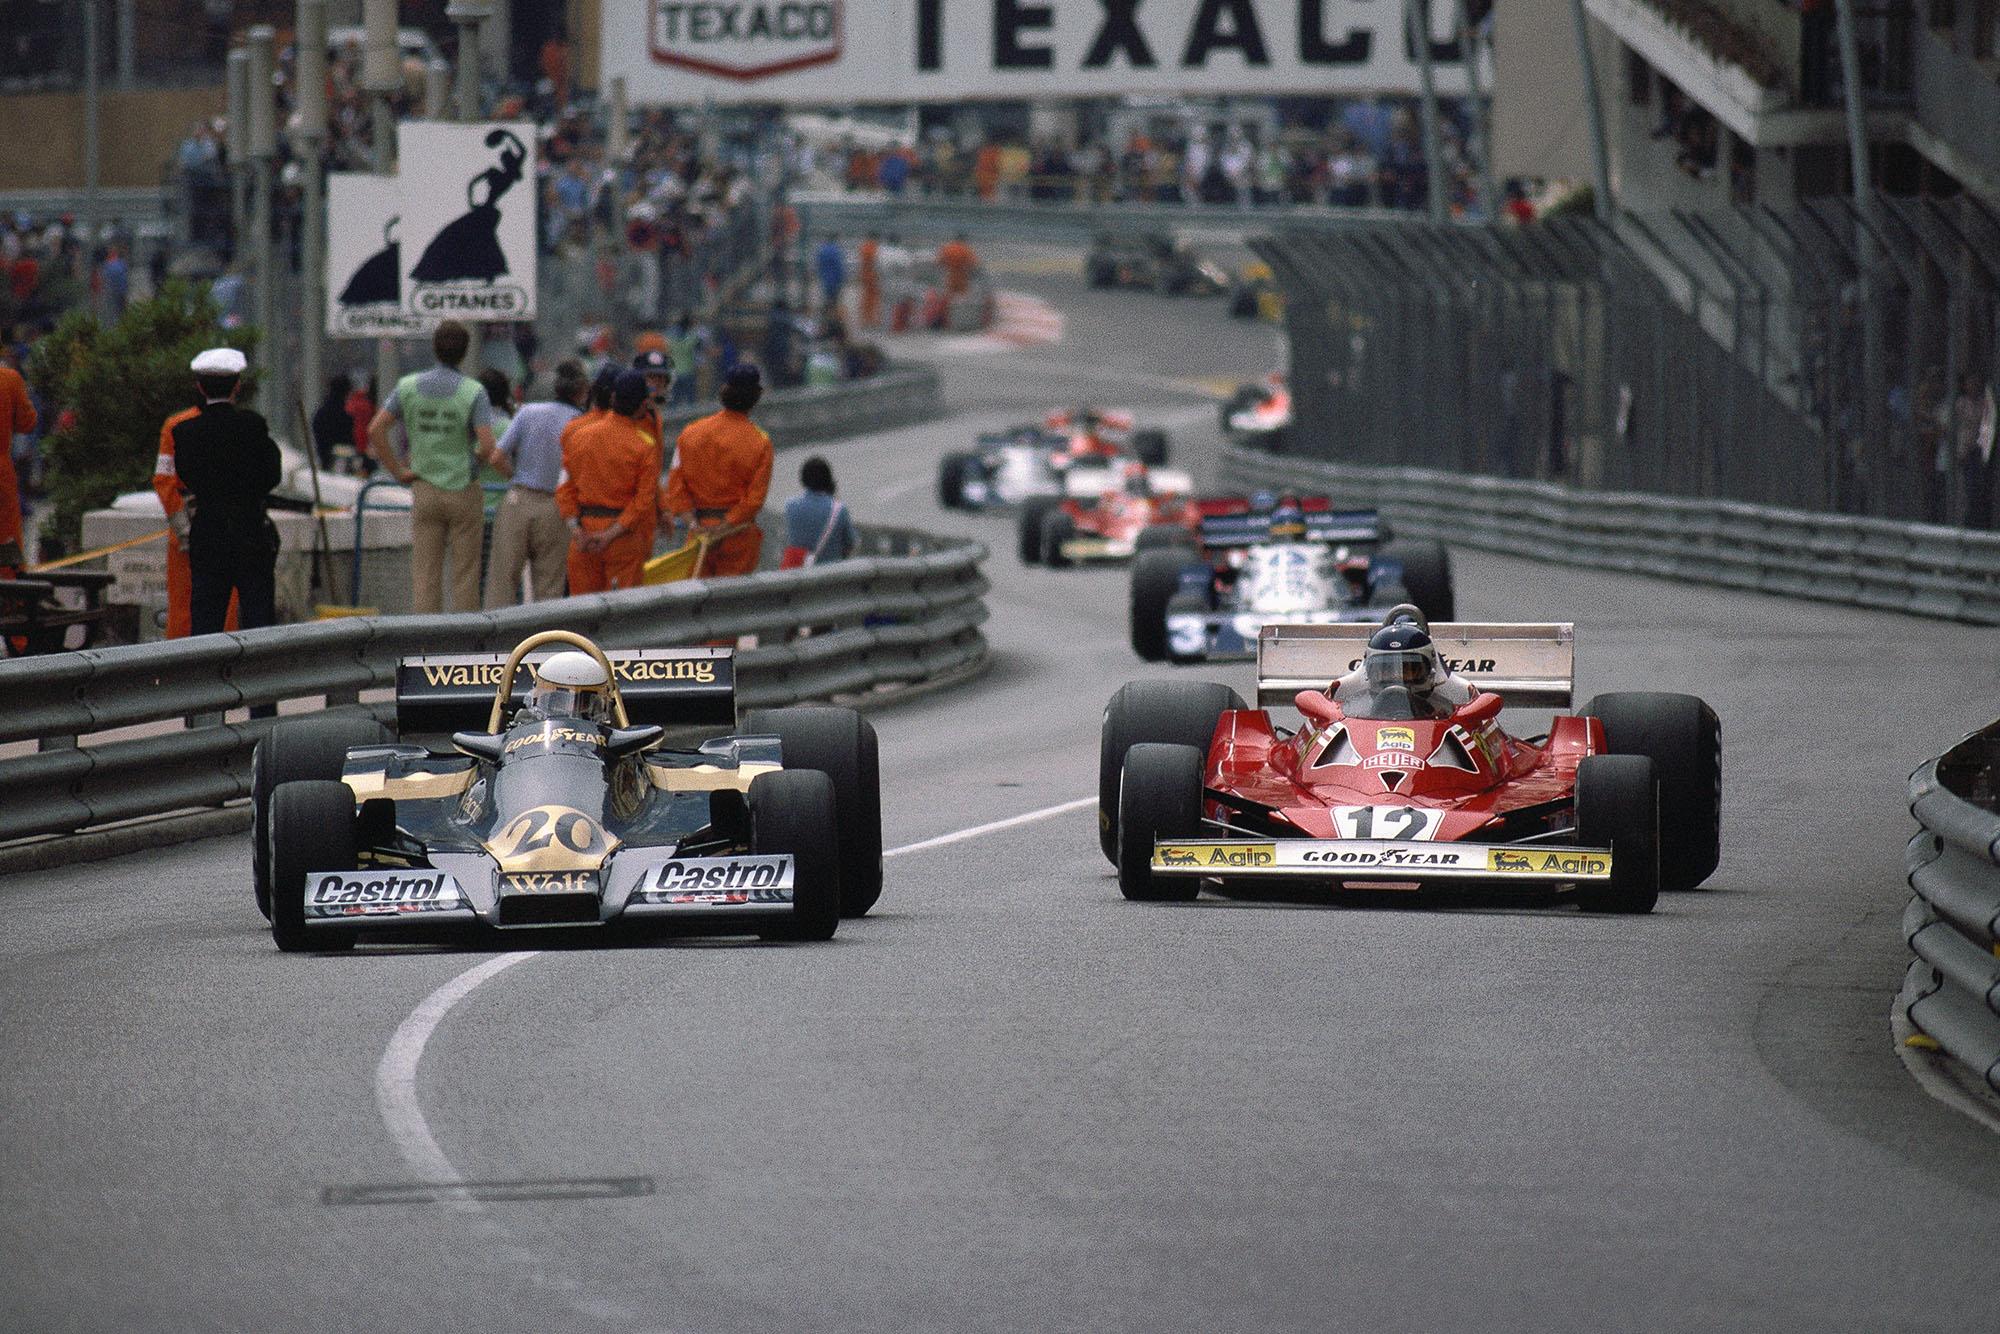 Jody Scheckter (Wolf) dices with Carlos Reutemann (Ferrari) at the 1977 Monaco Grand Prix.